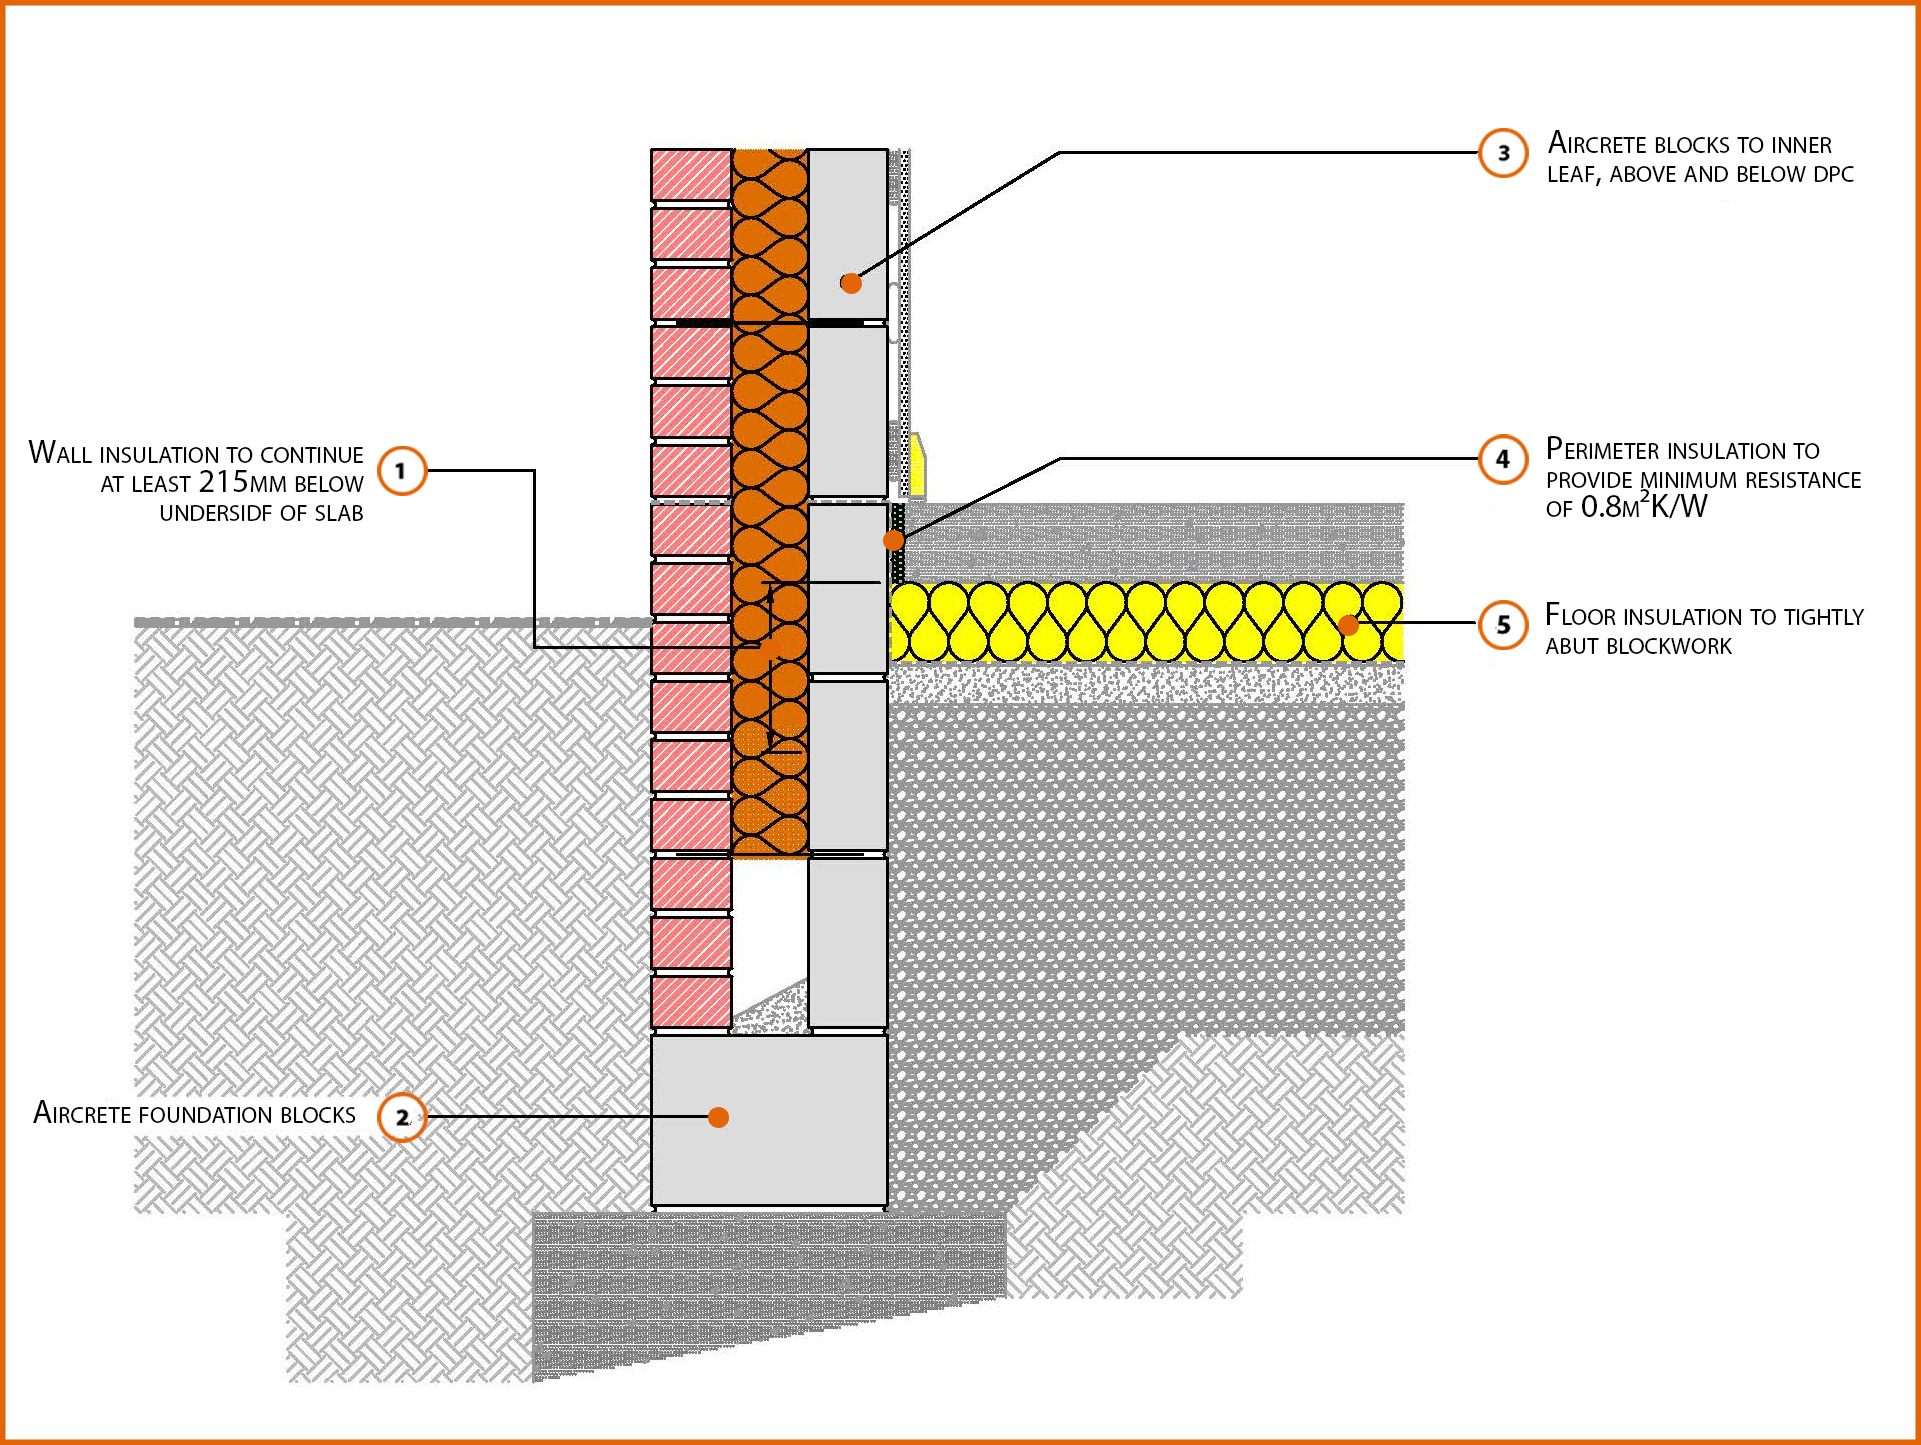 E5mcff23 Concrete Ground Bearing Floor Insulation Below